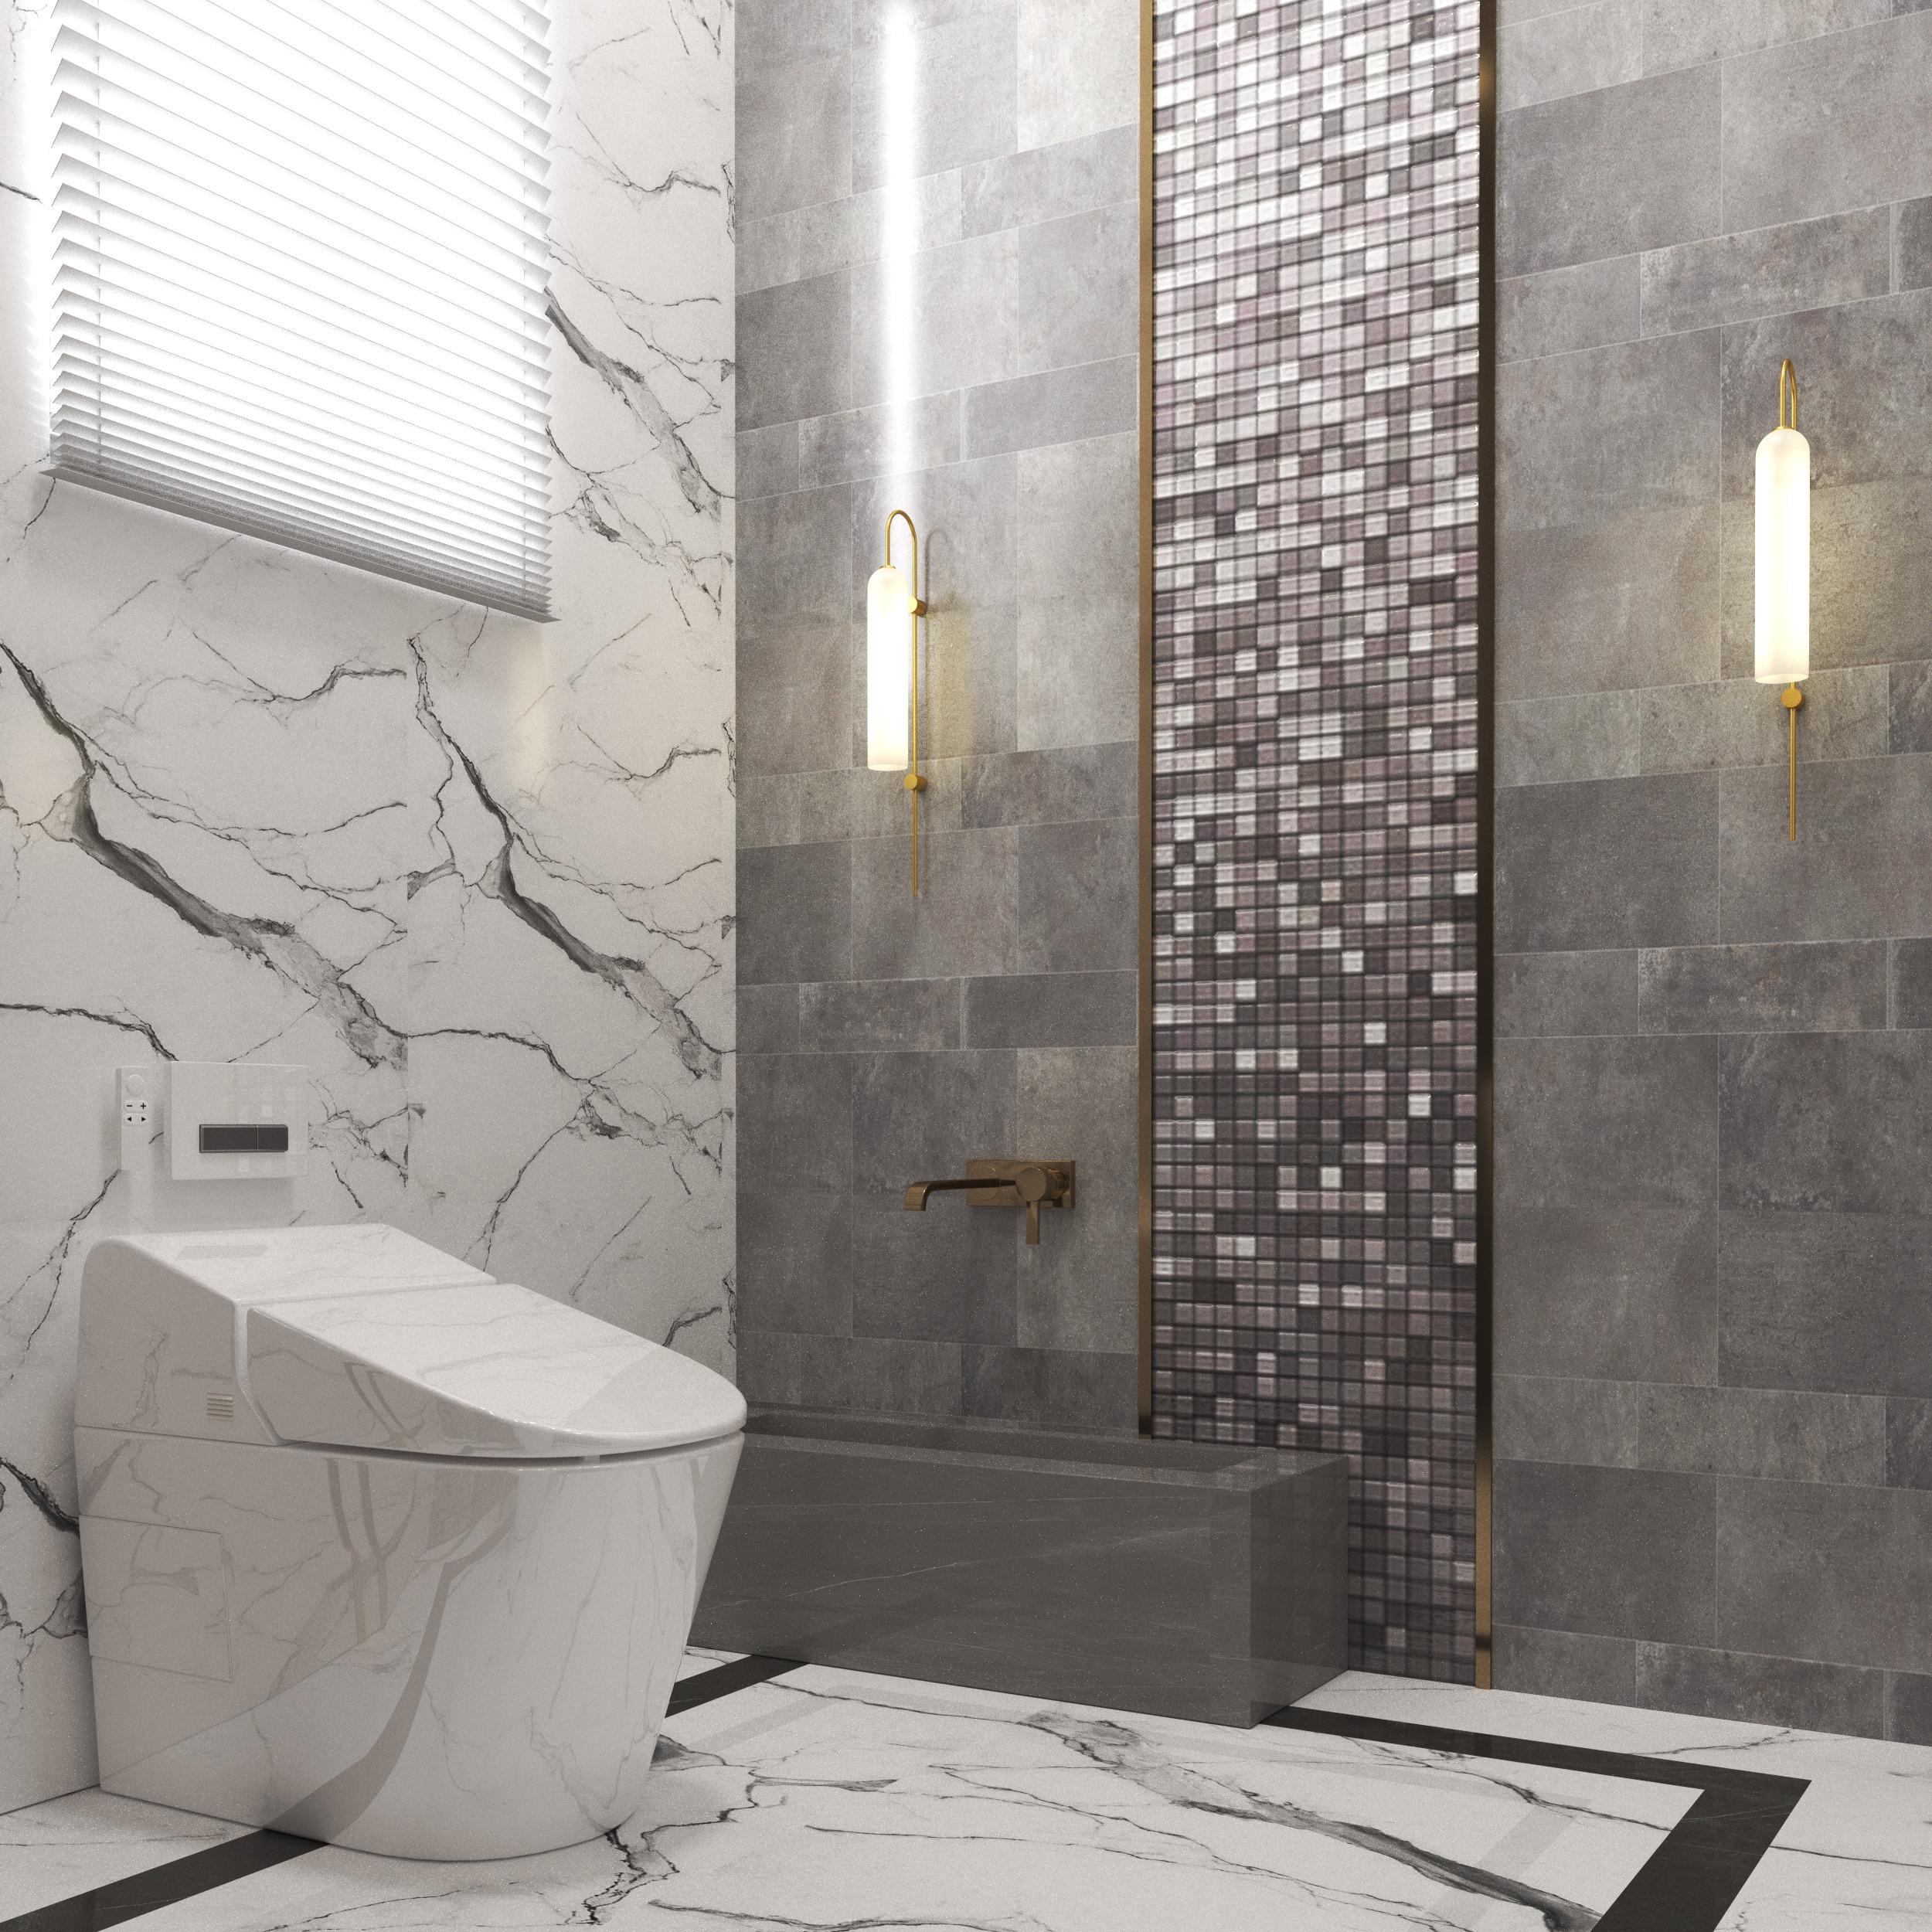 BATHROOMS - DESIGNING - MARBLE